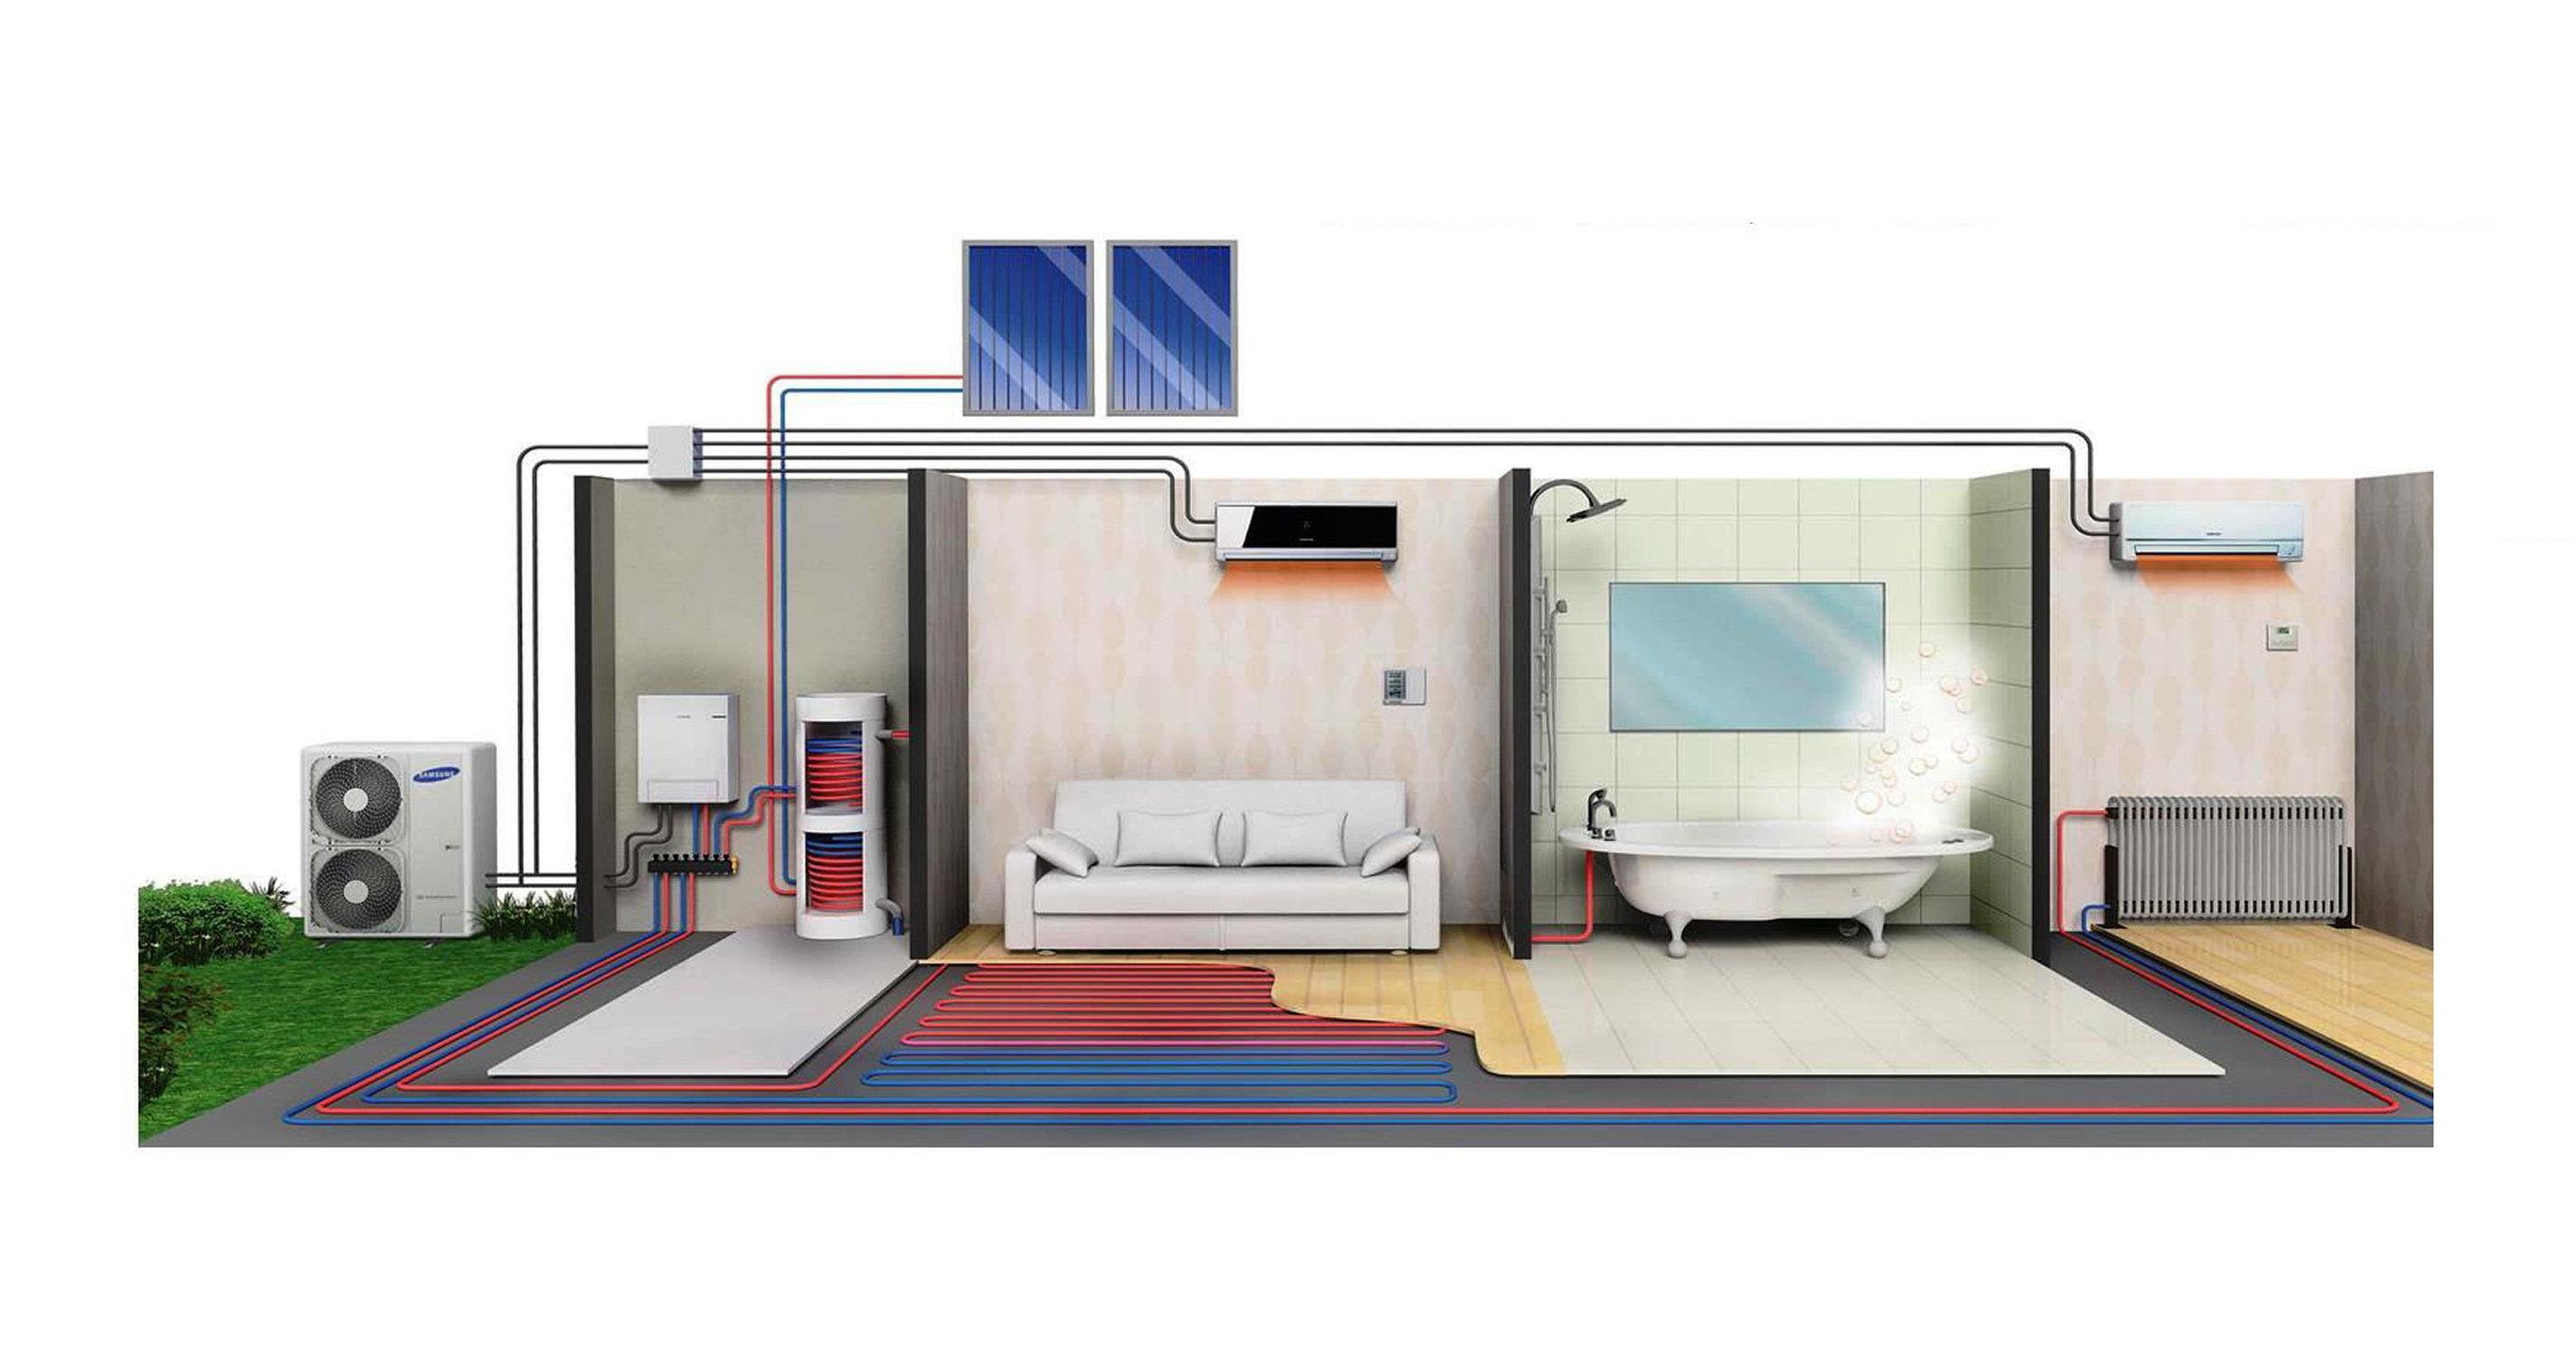 Riscaldamento E Raffrescamento Ad Aria.Ductless Air Conditioning Systems Rci Riscaldamento